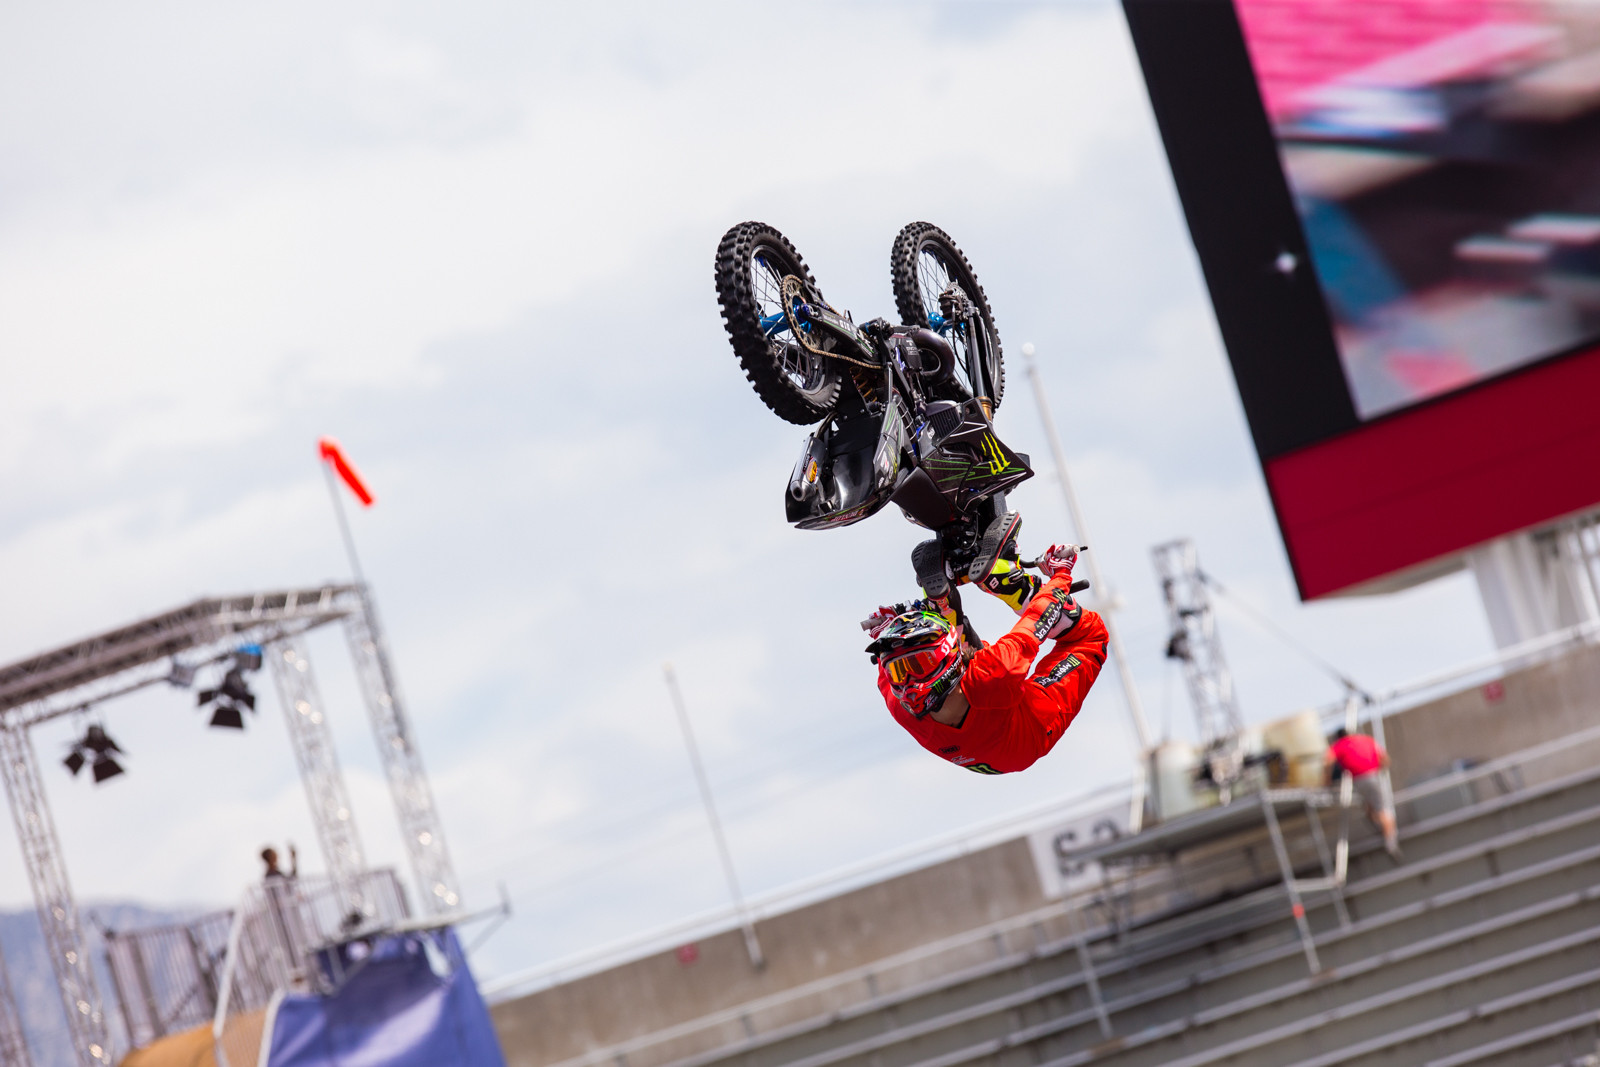 Taka Higashino - 2016 Nitro World Games: FMX Qualifying Gallery - Motocross Pictures - Vital MX